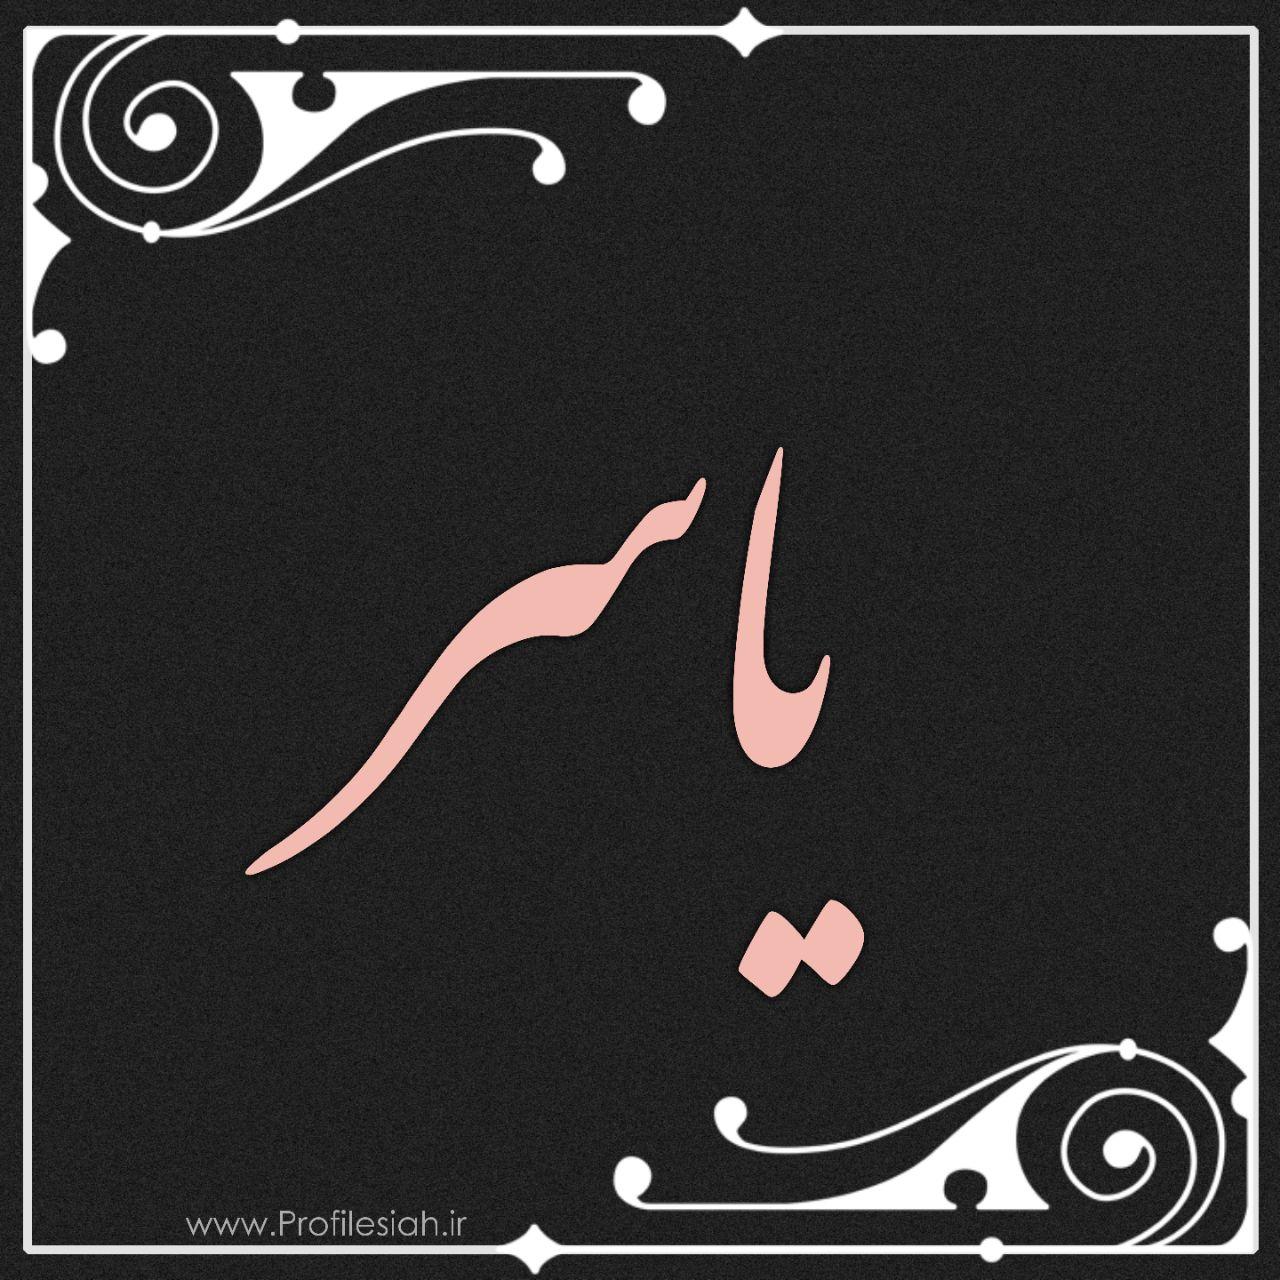 لوگو و عکس نوشته ی اسم یاسر